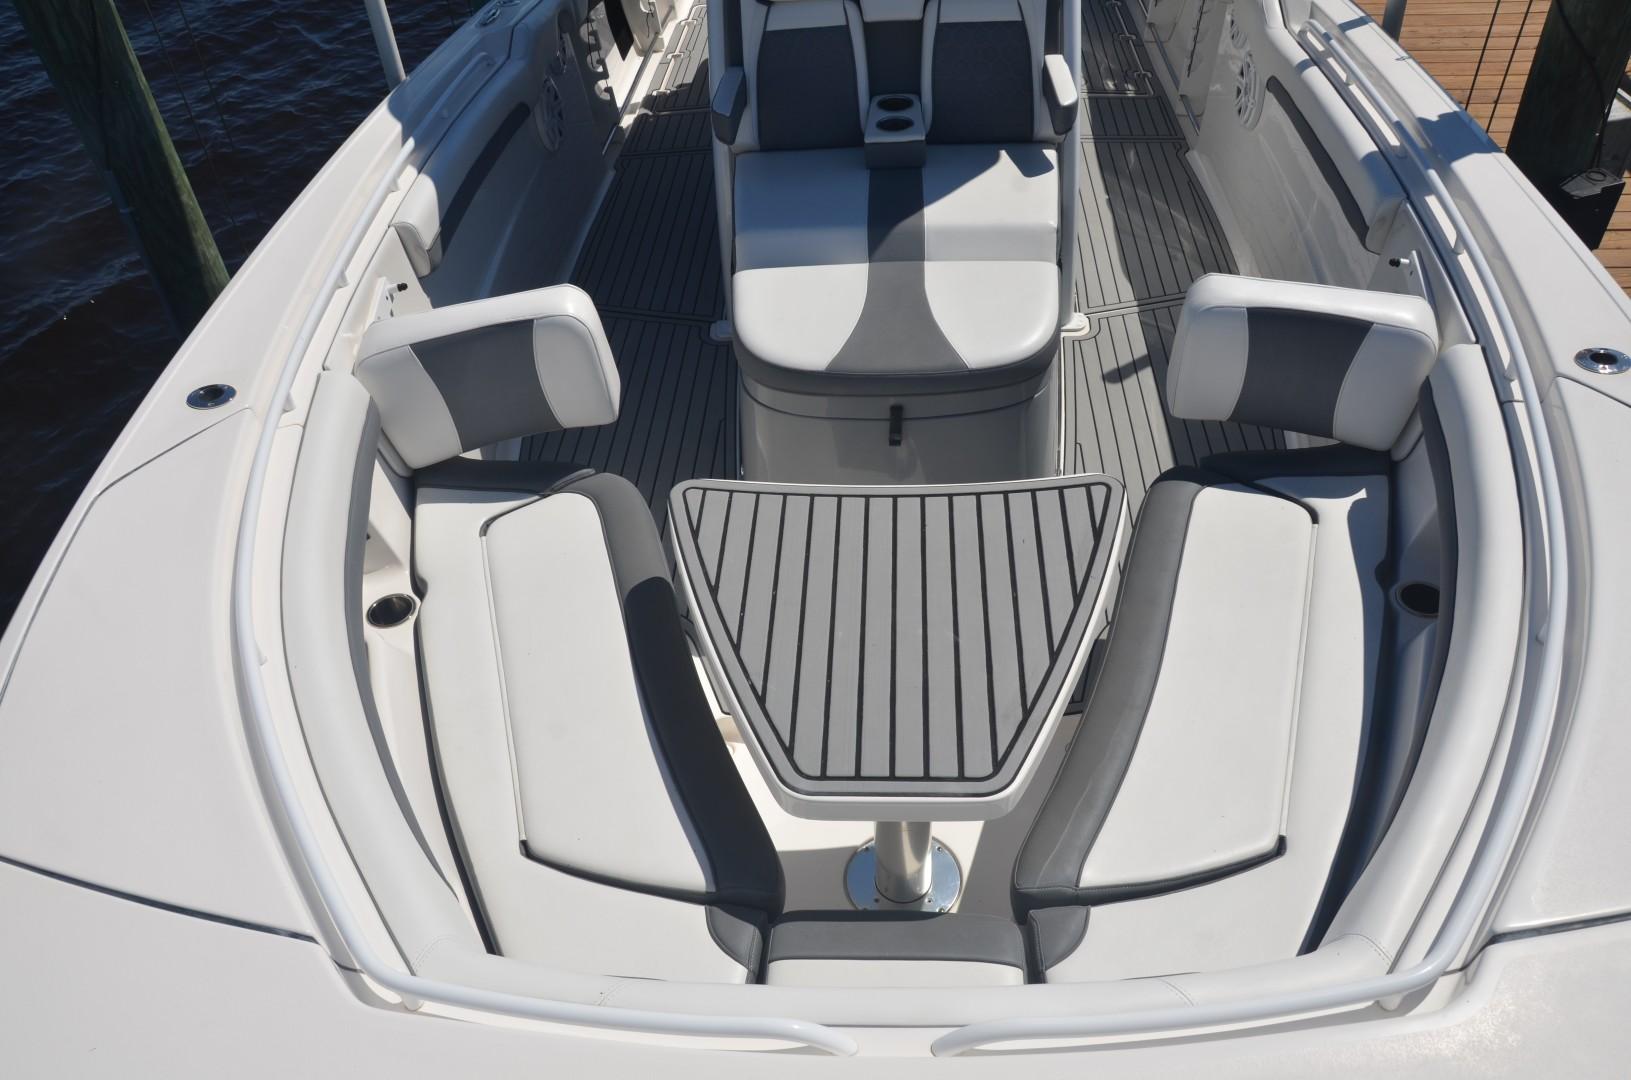 Tidewater 320 CC - forward seating